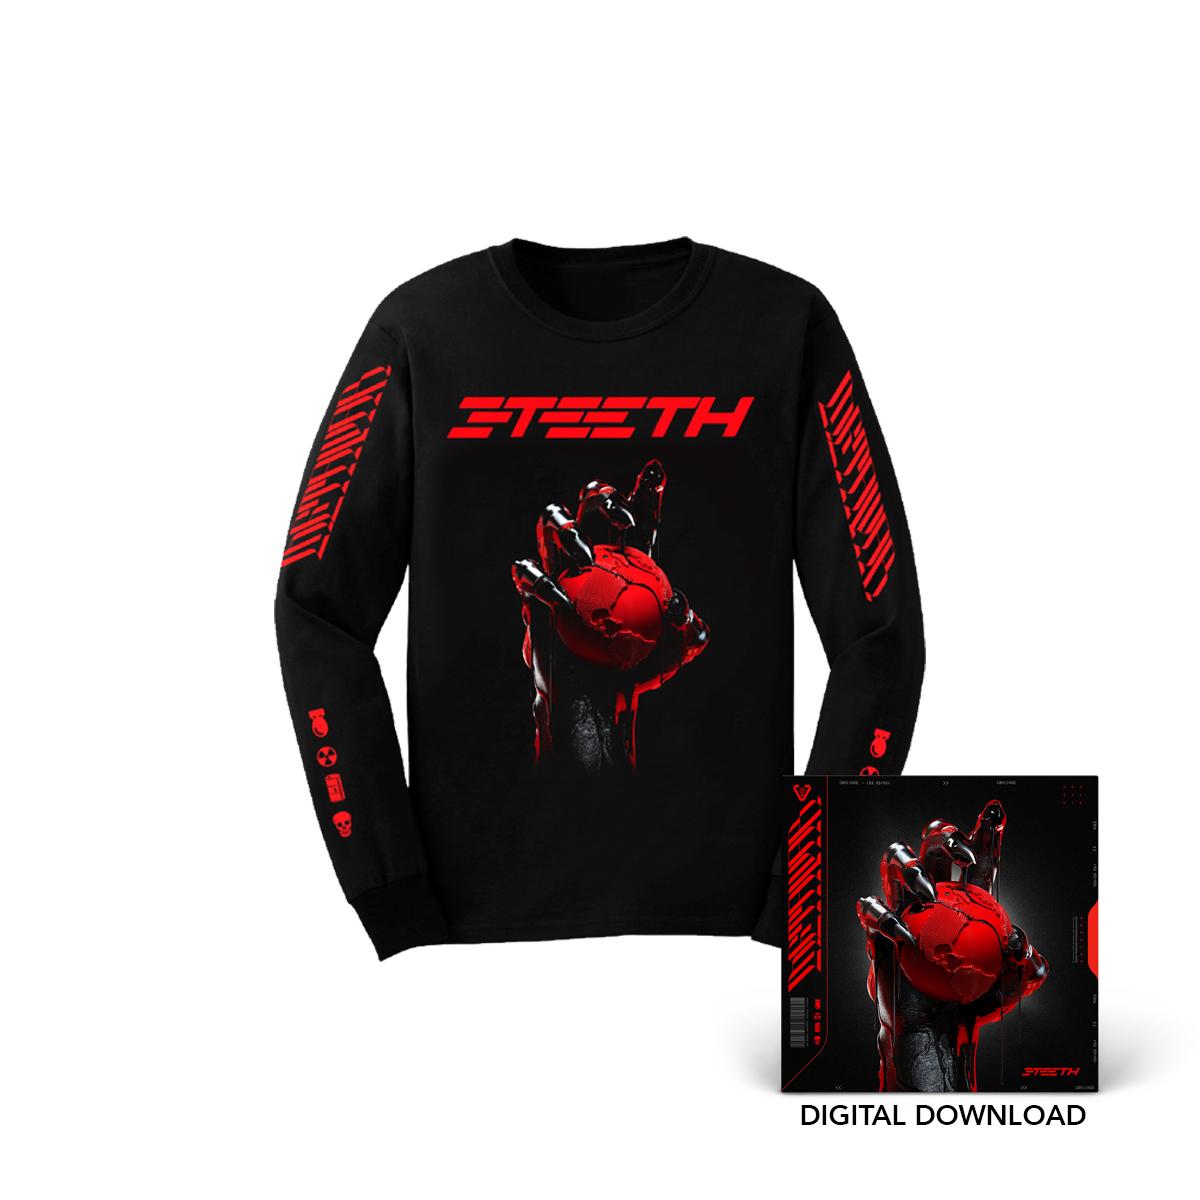 3TEETH METAWAR Longsleeve T-Shirt + Digital Download Bundle